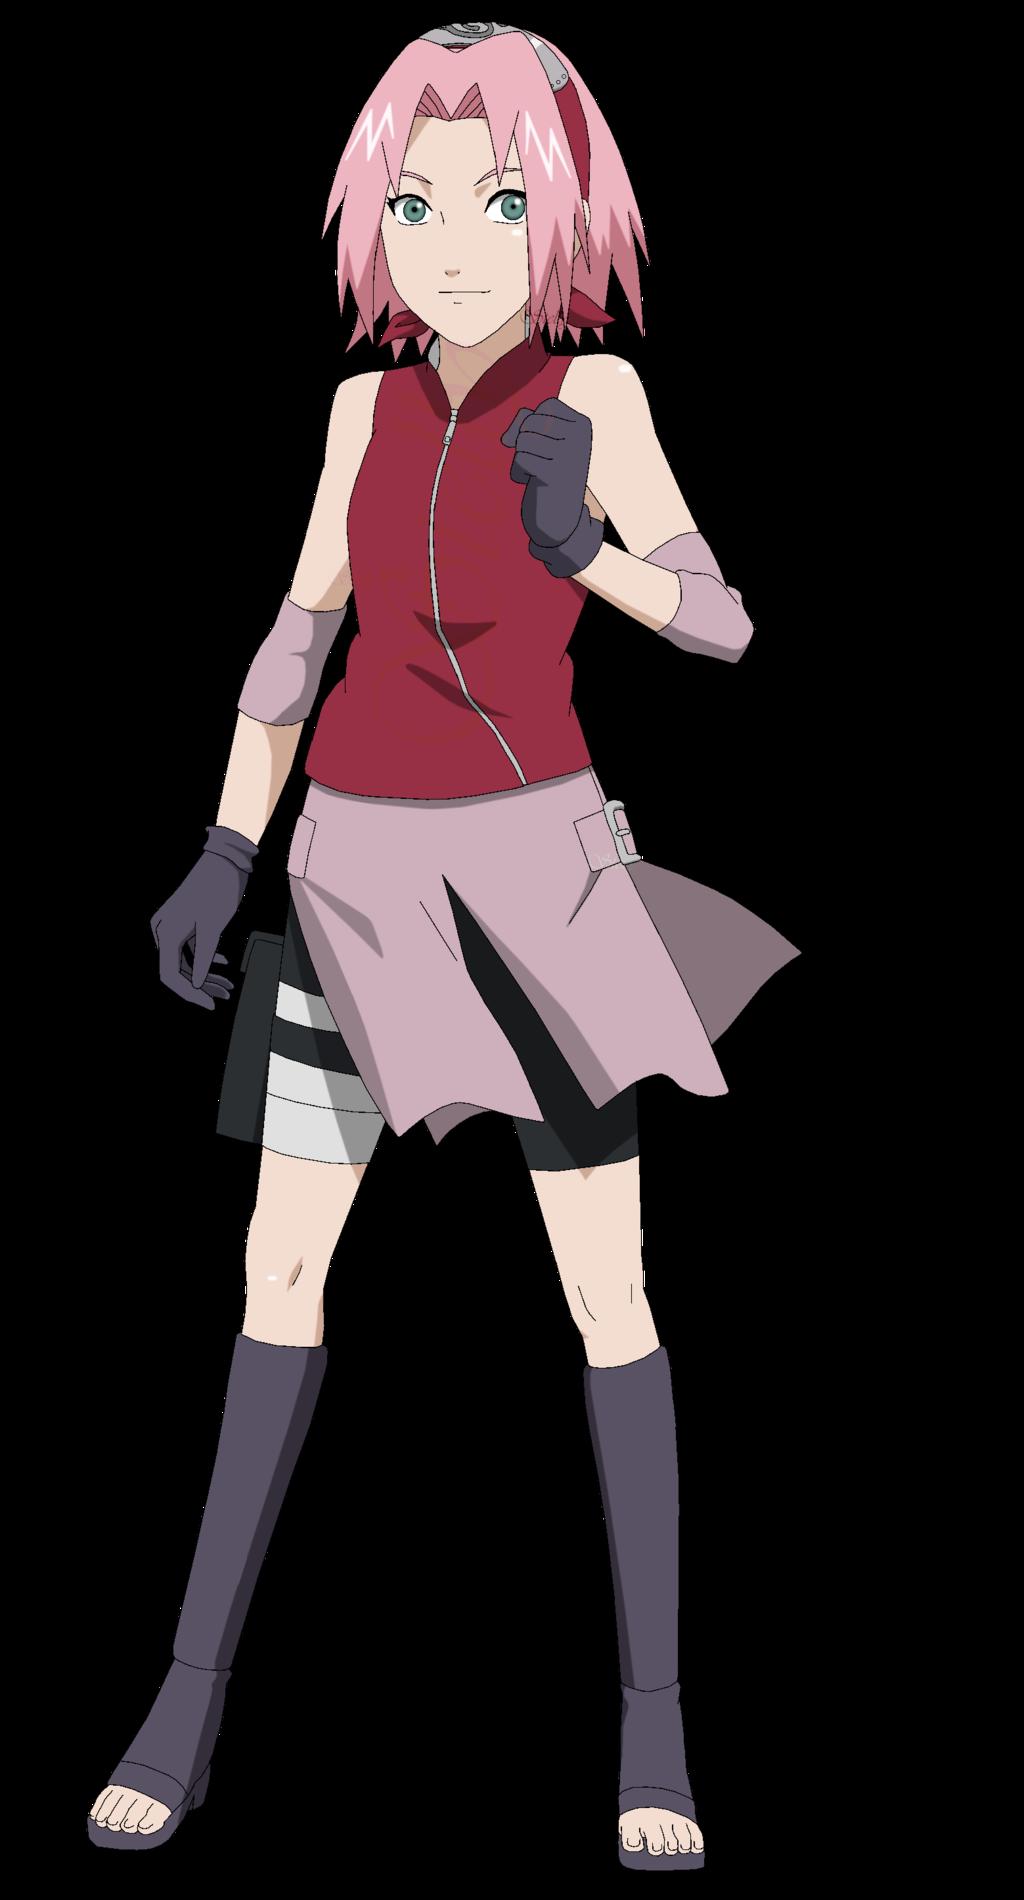 Sakura Haruno Shippuden - Lineart Colored by DennisStelly ...